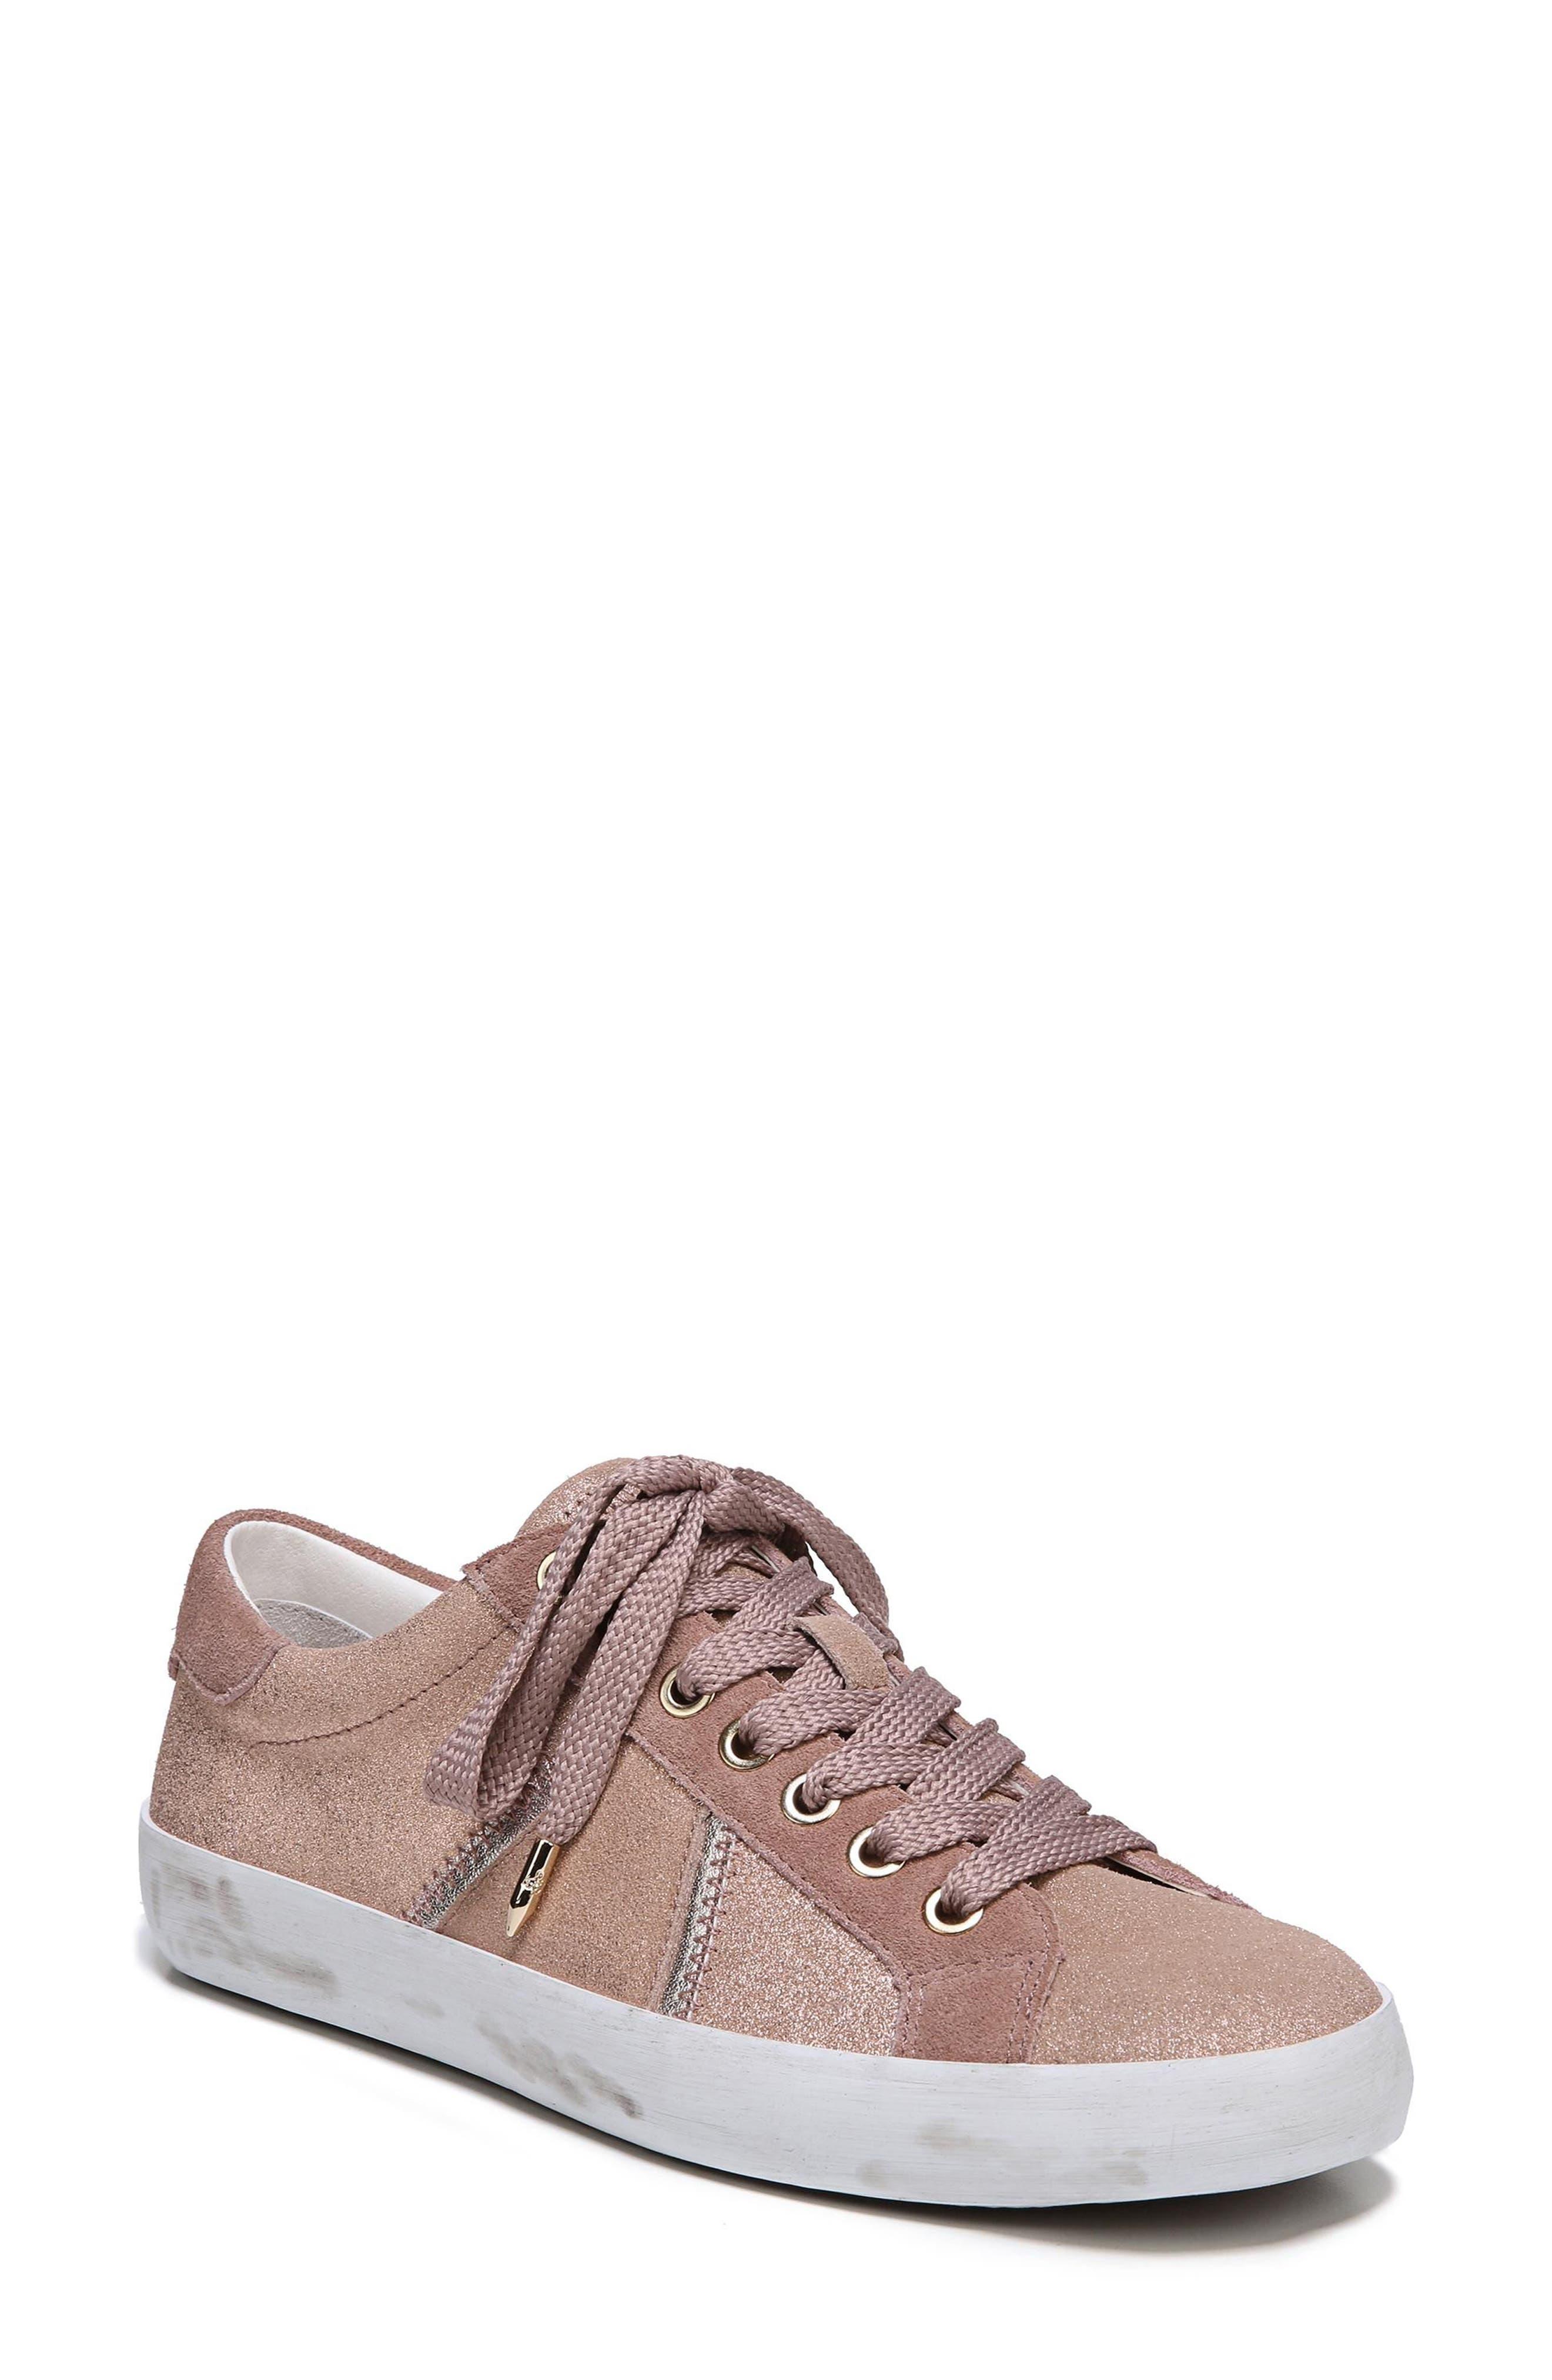 Baylee Sneaker,                             Main thumbnail 1, color,